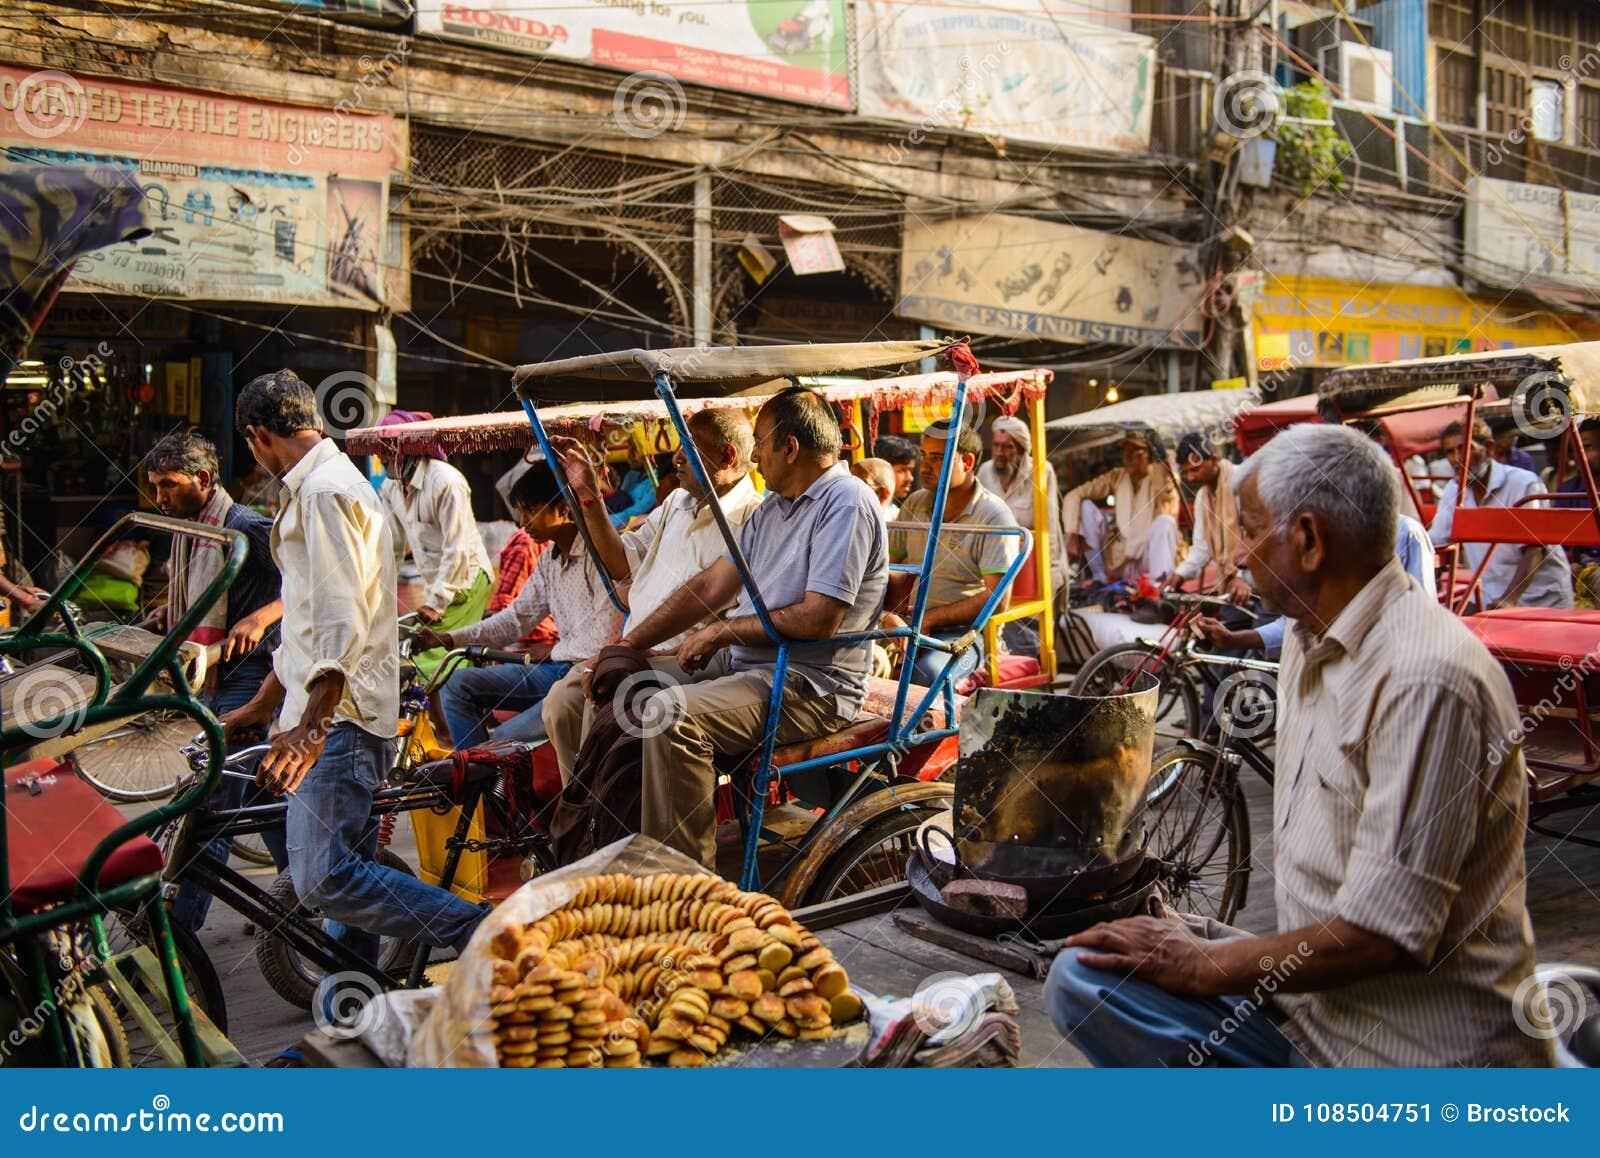 New Delhi, India - April 16, 2016 : Rickshaw rider transports passenger on April 16, 2016 in New Delhi